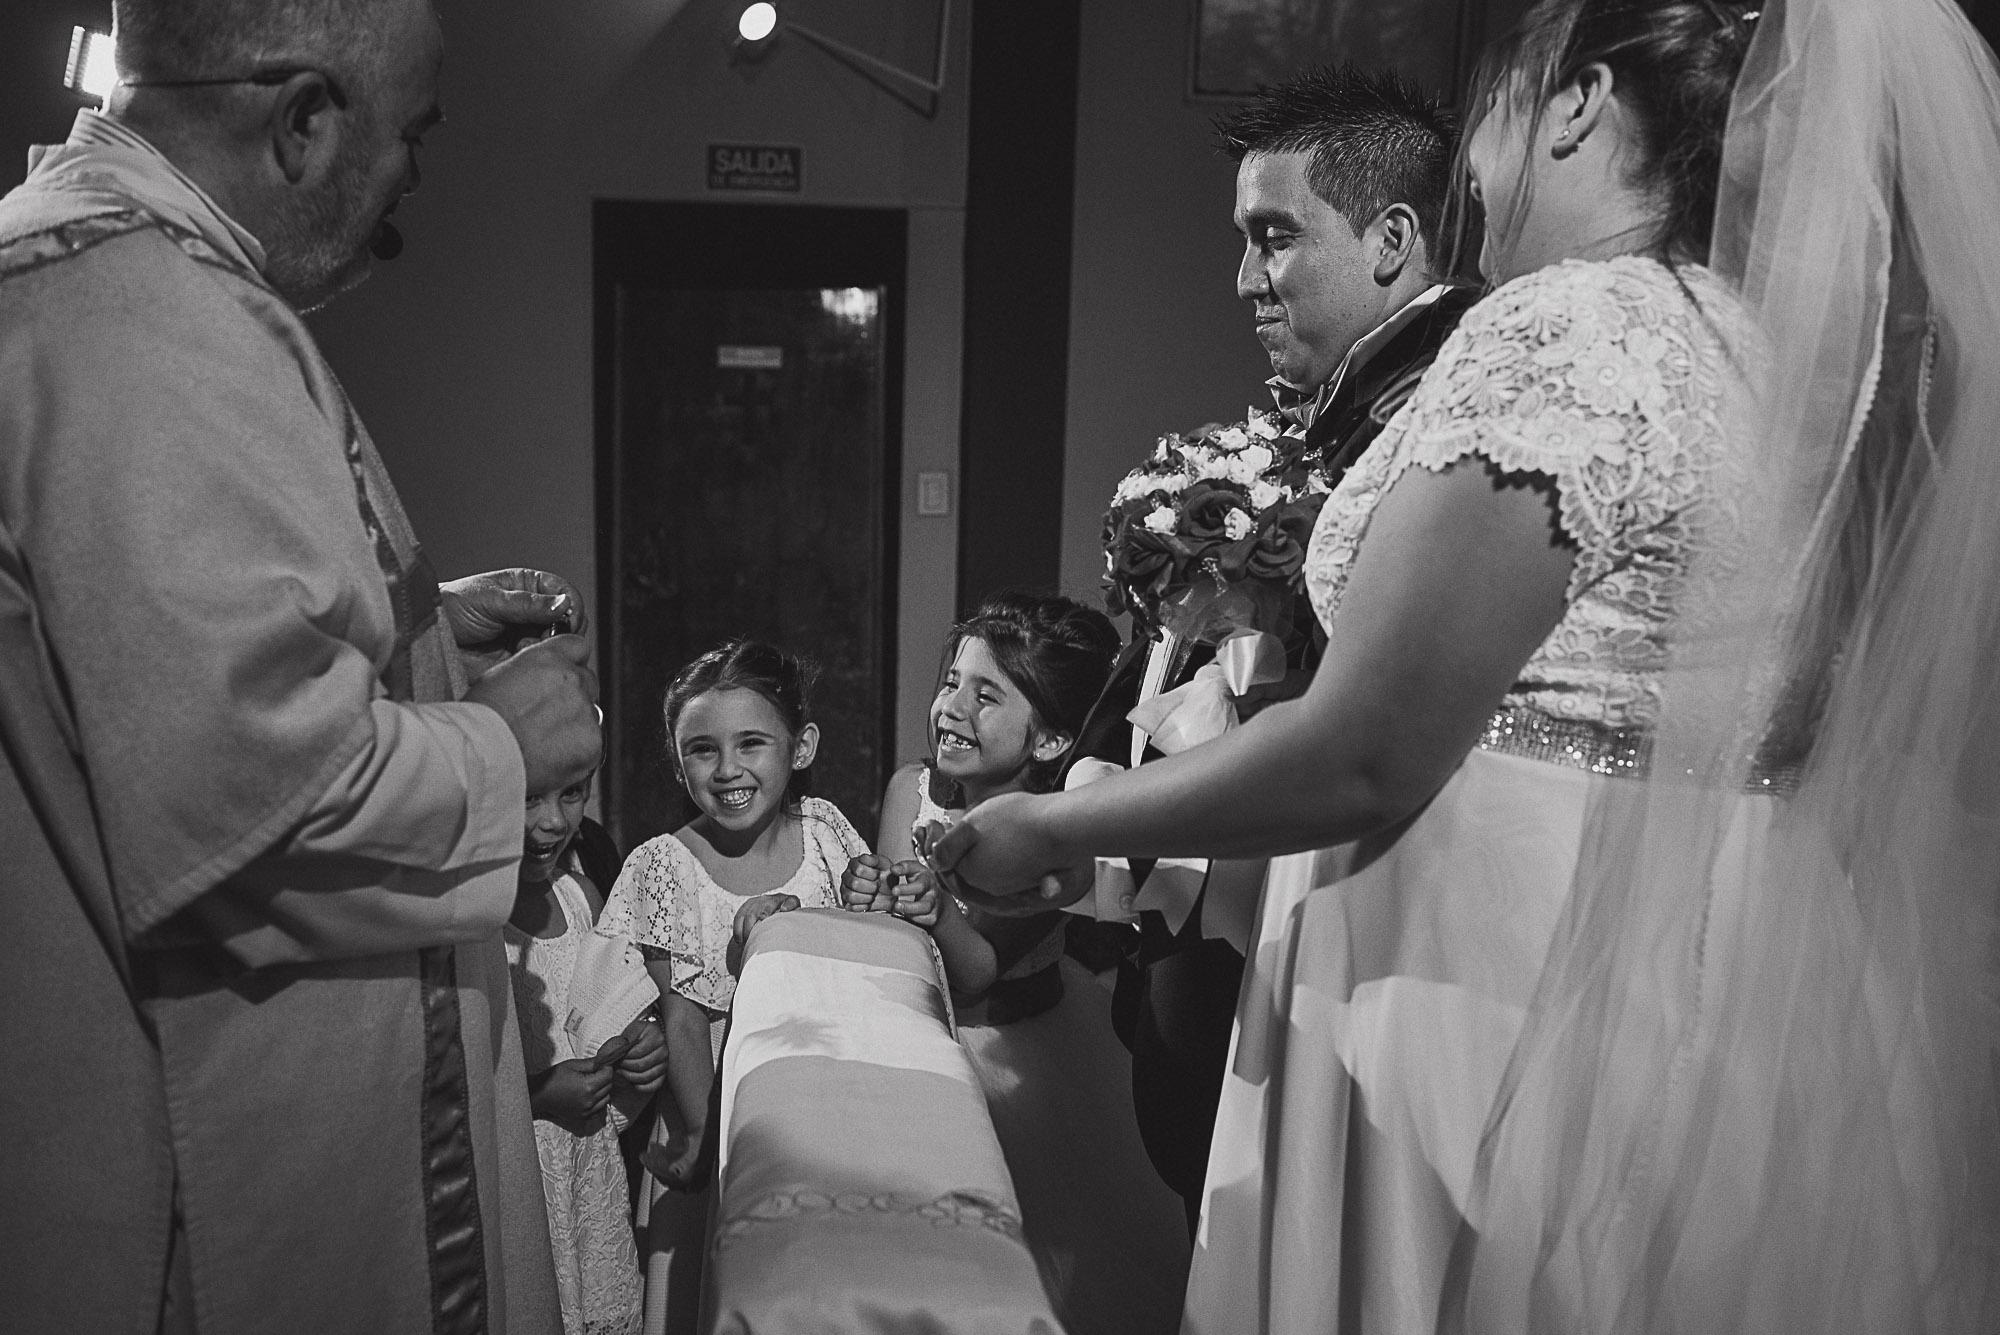 boda-vero-raul-patagonia-argentina-chilena-fotografo-de-bodas-argentina-casamiento-en-patagonia-gabriel-roa-photography-13